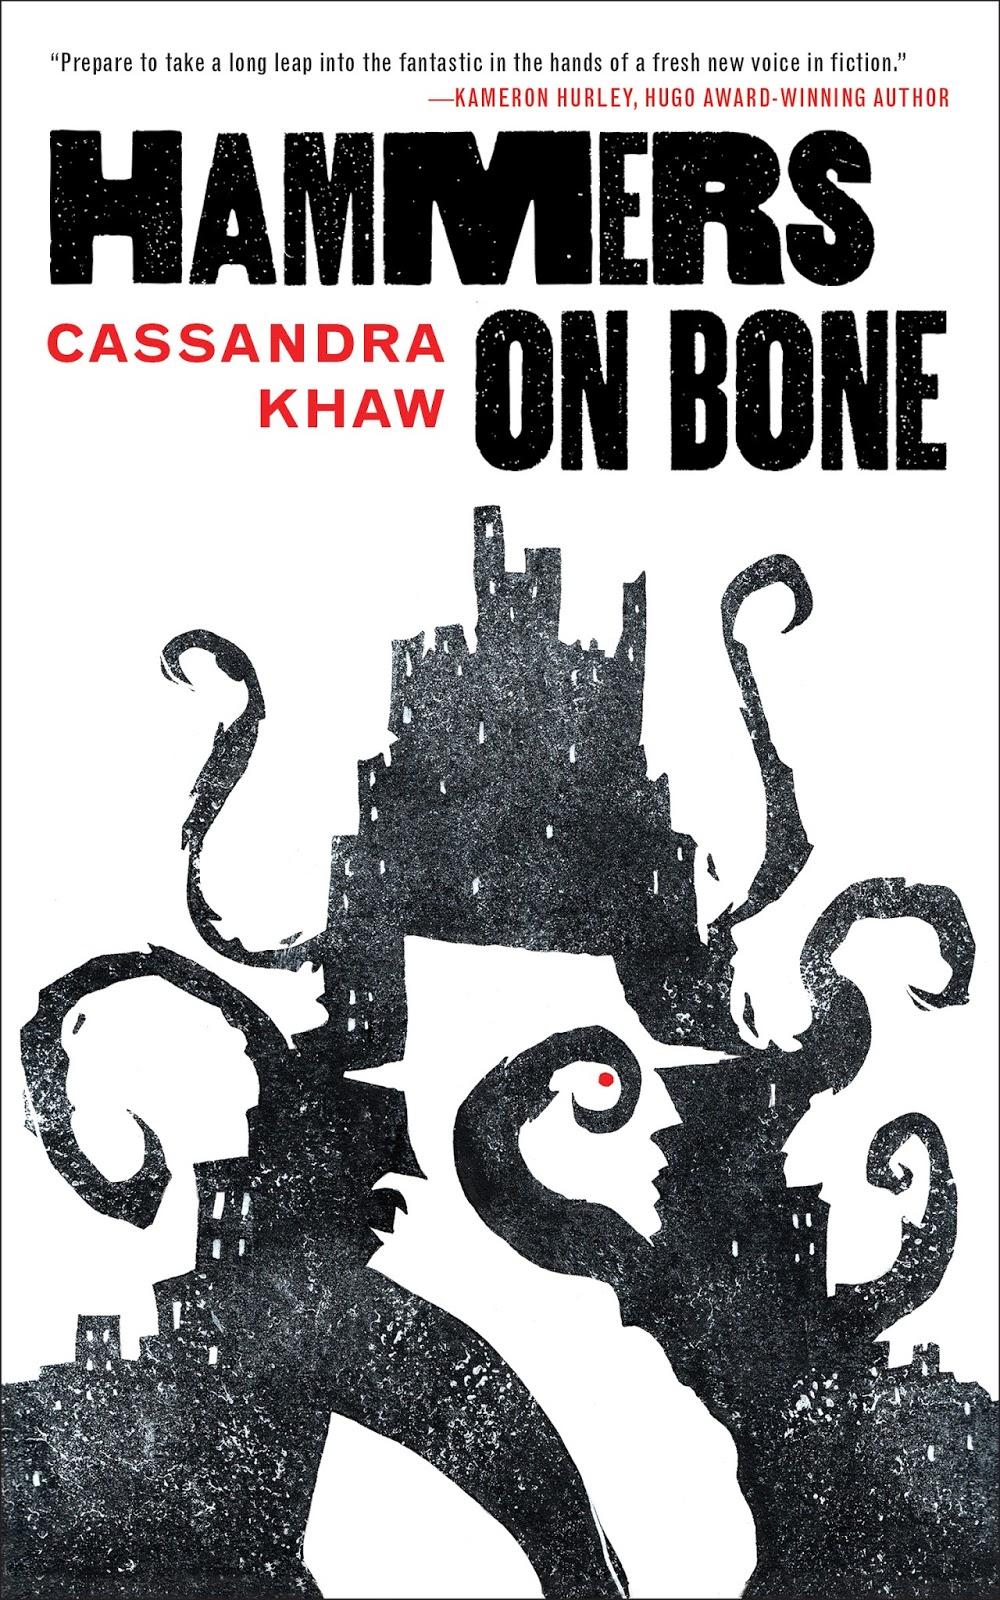 Cassandra Khaw: Five Things I Learned Writing Hammers On Bone